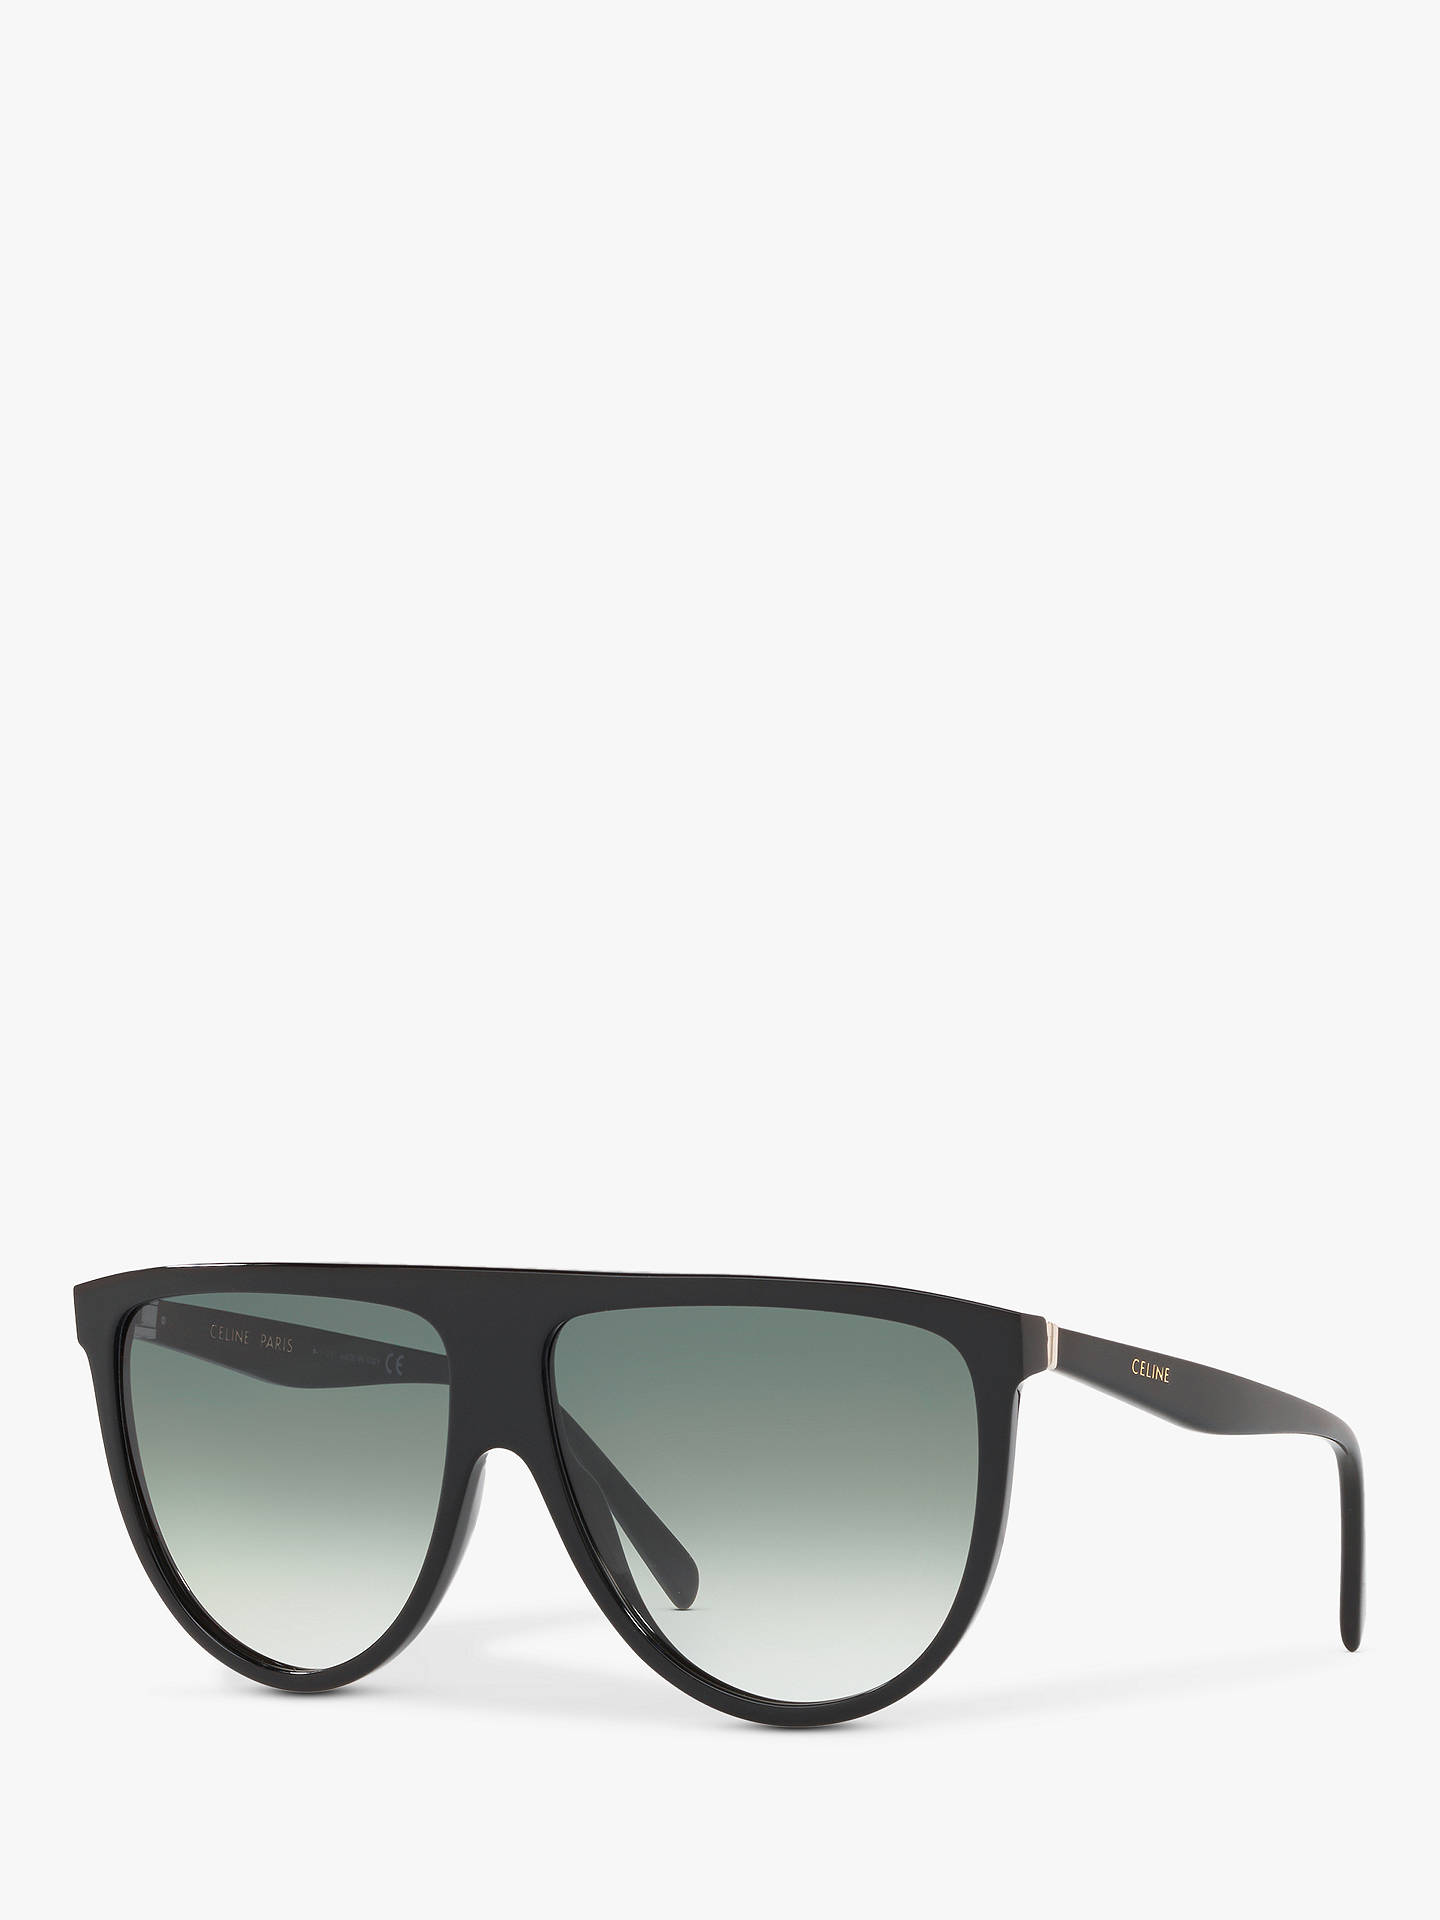 Celine Cl4006 In Women's Rectangular Sunglasses, Black/Pale Green Gradient by Celine